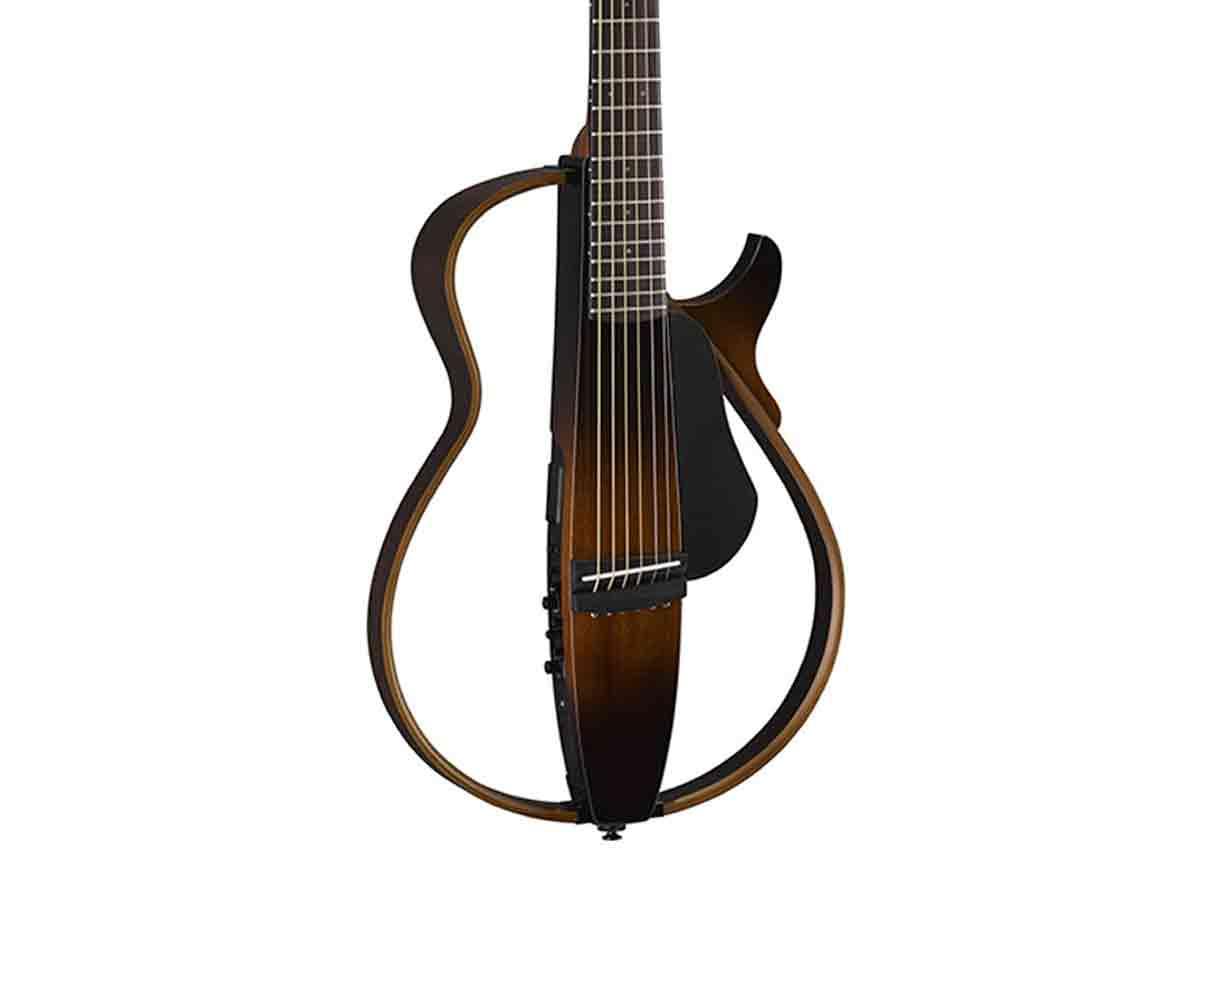 Yamaha slg200s steel string silent guitar tobacco for Yamaha slg200s steel string silent guitar